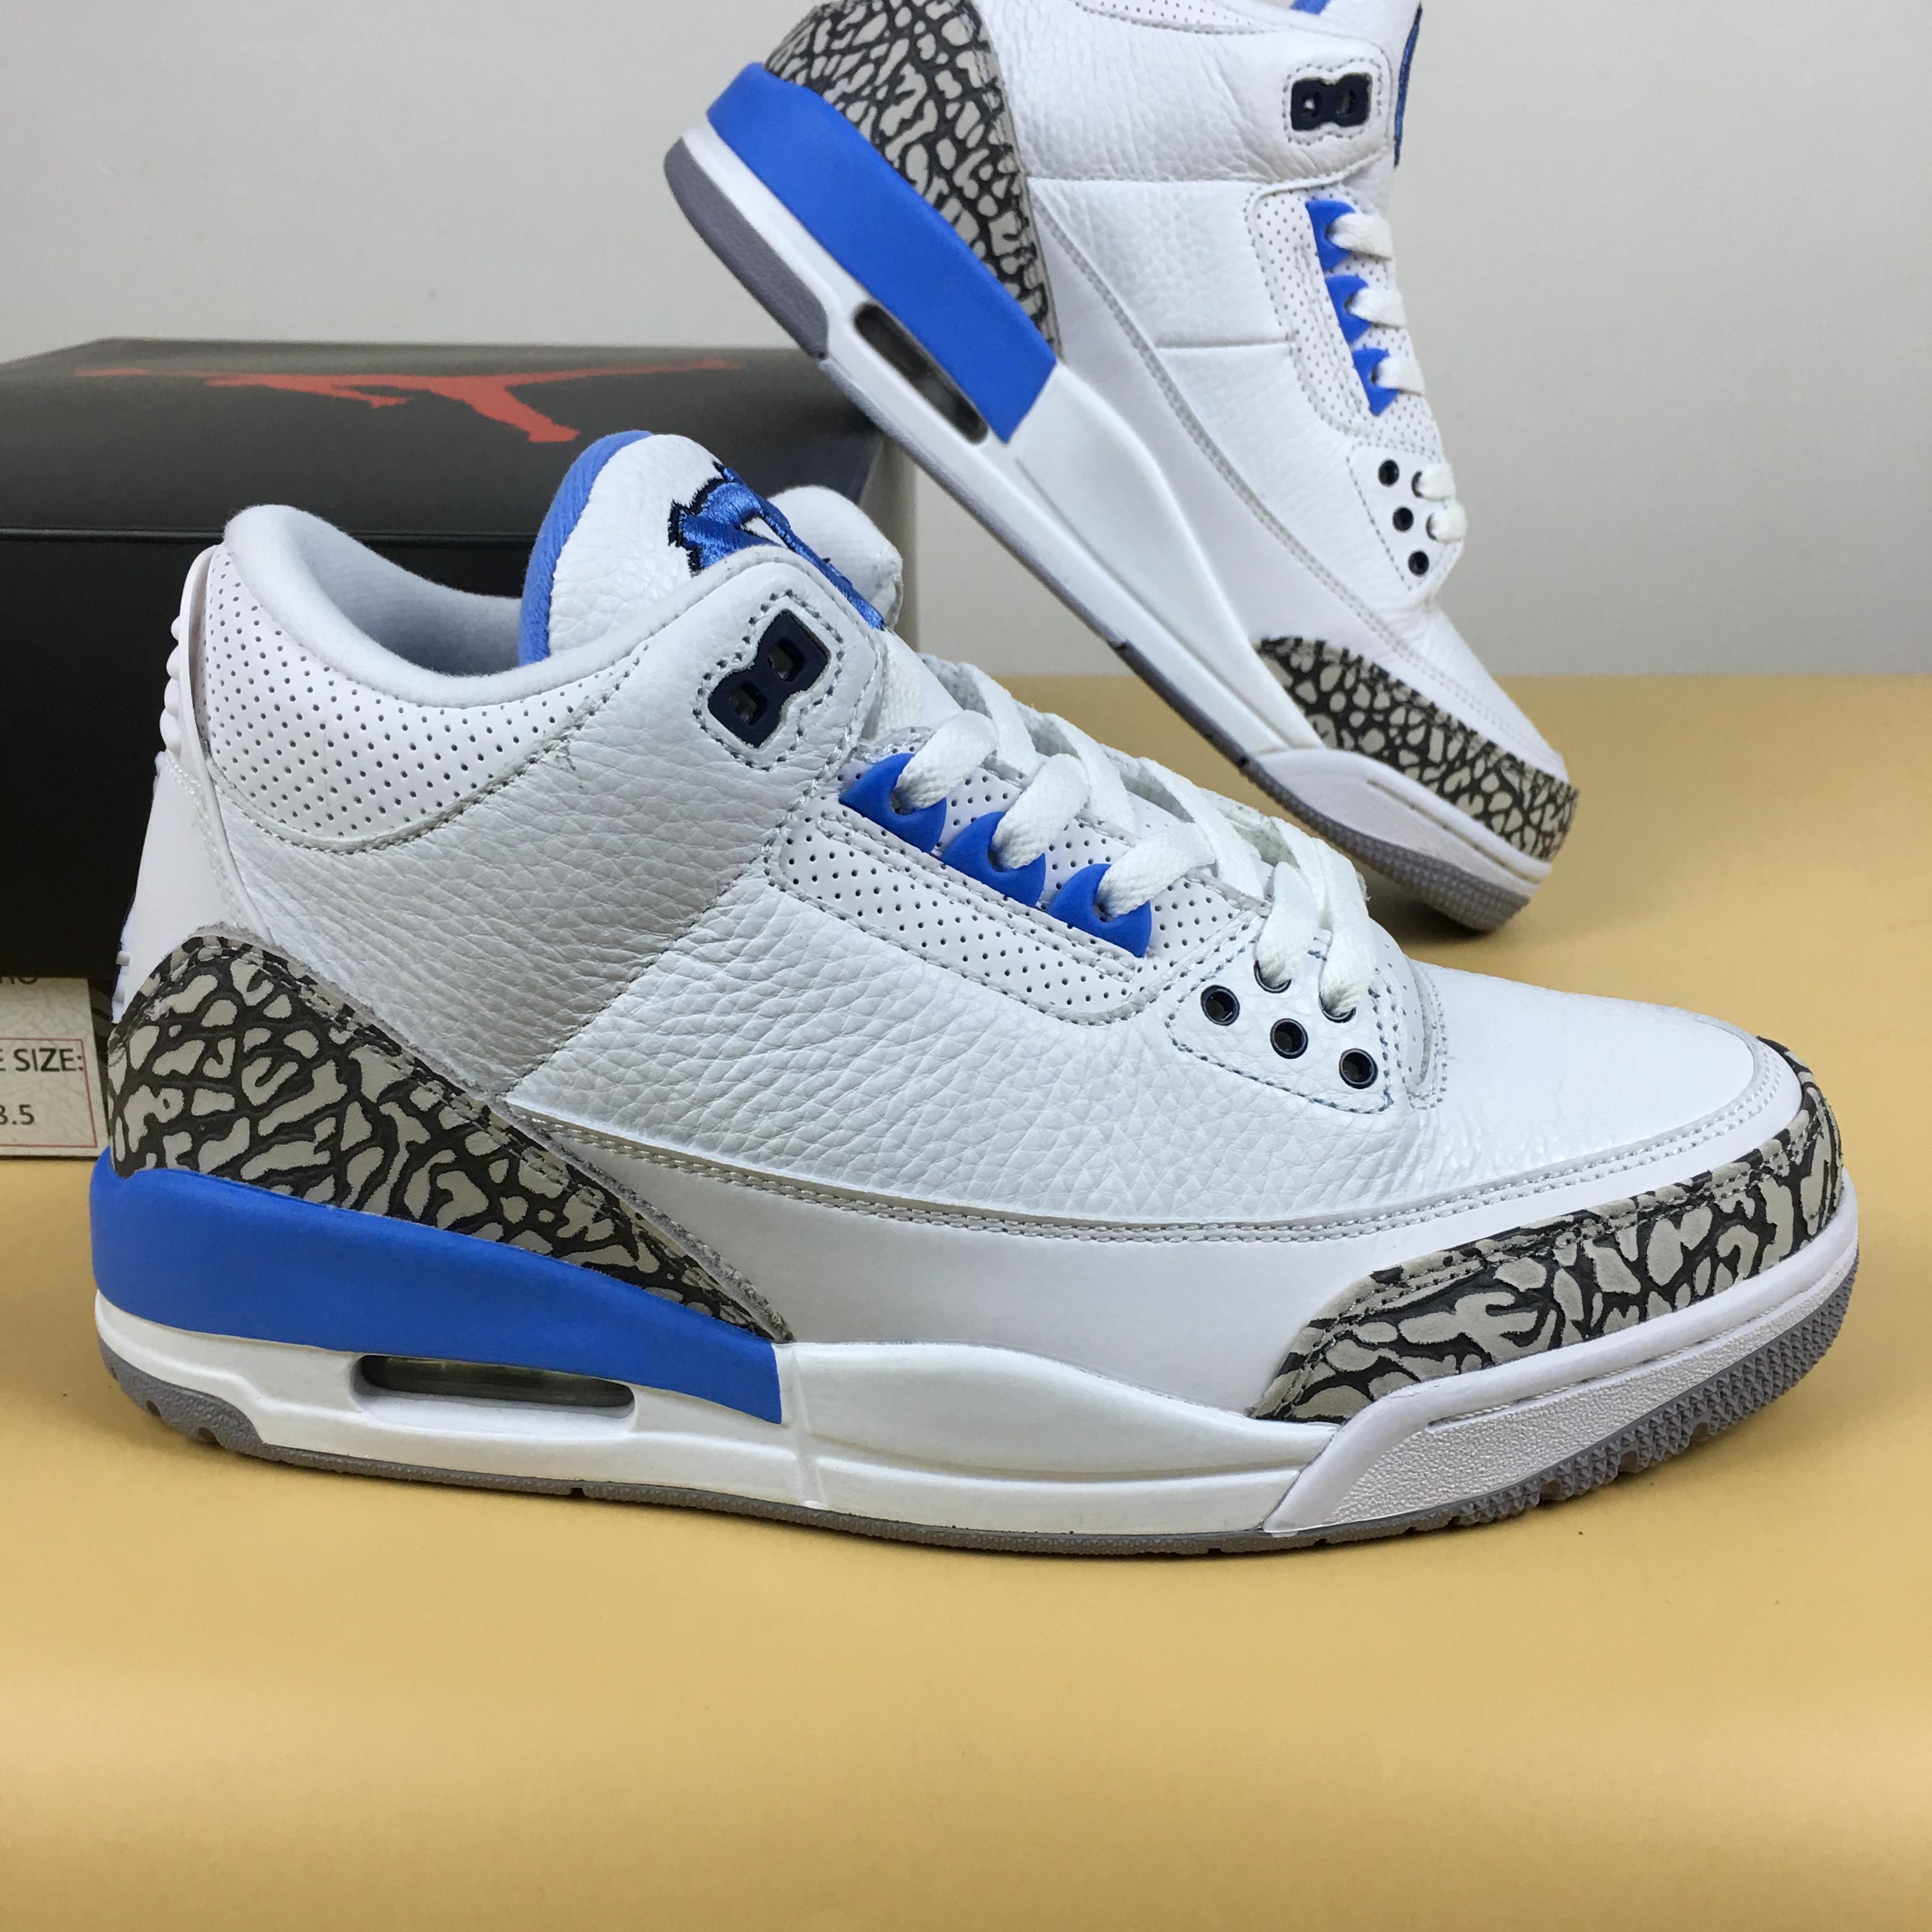 Air Jordans 3